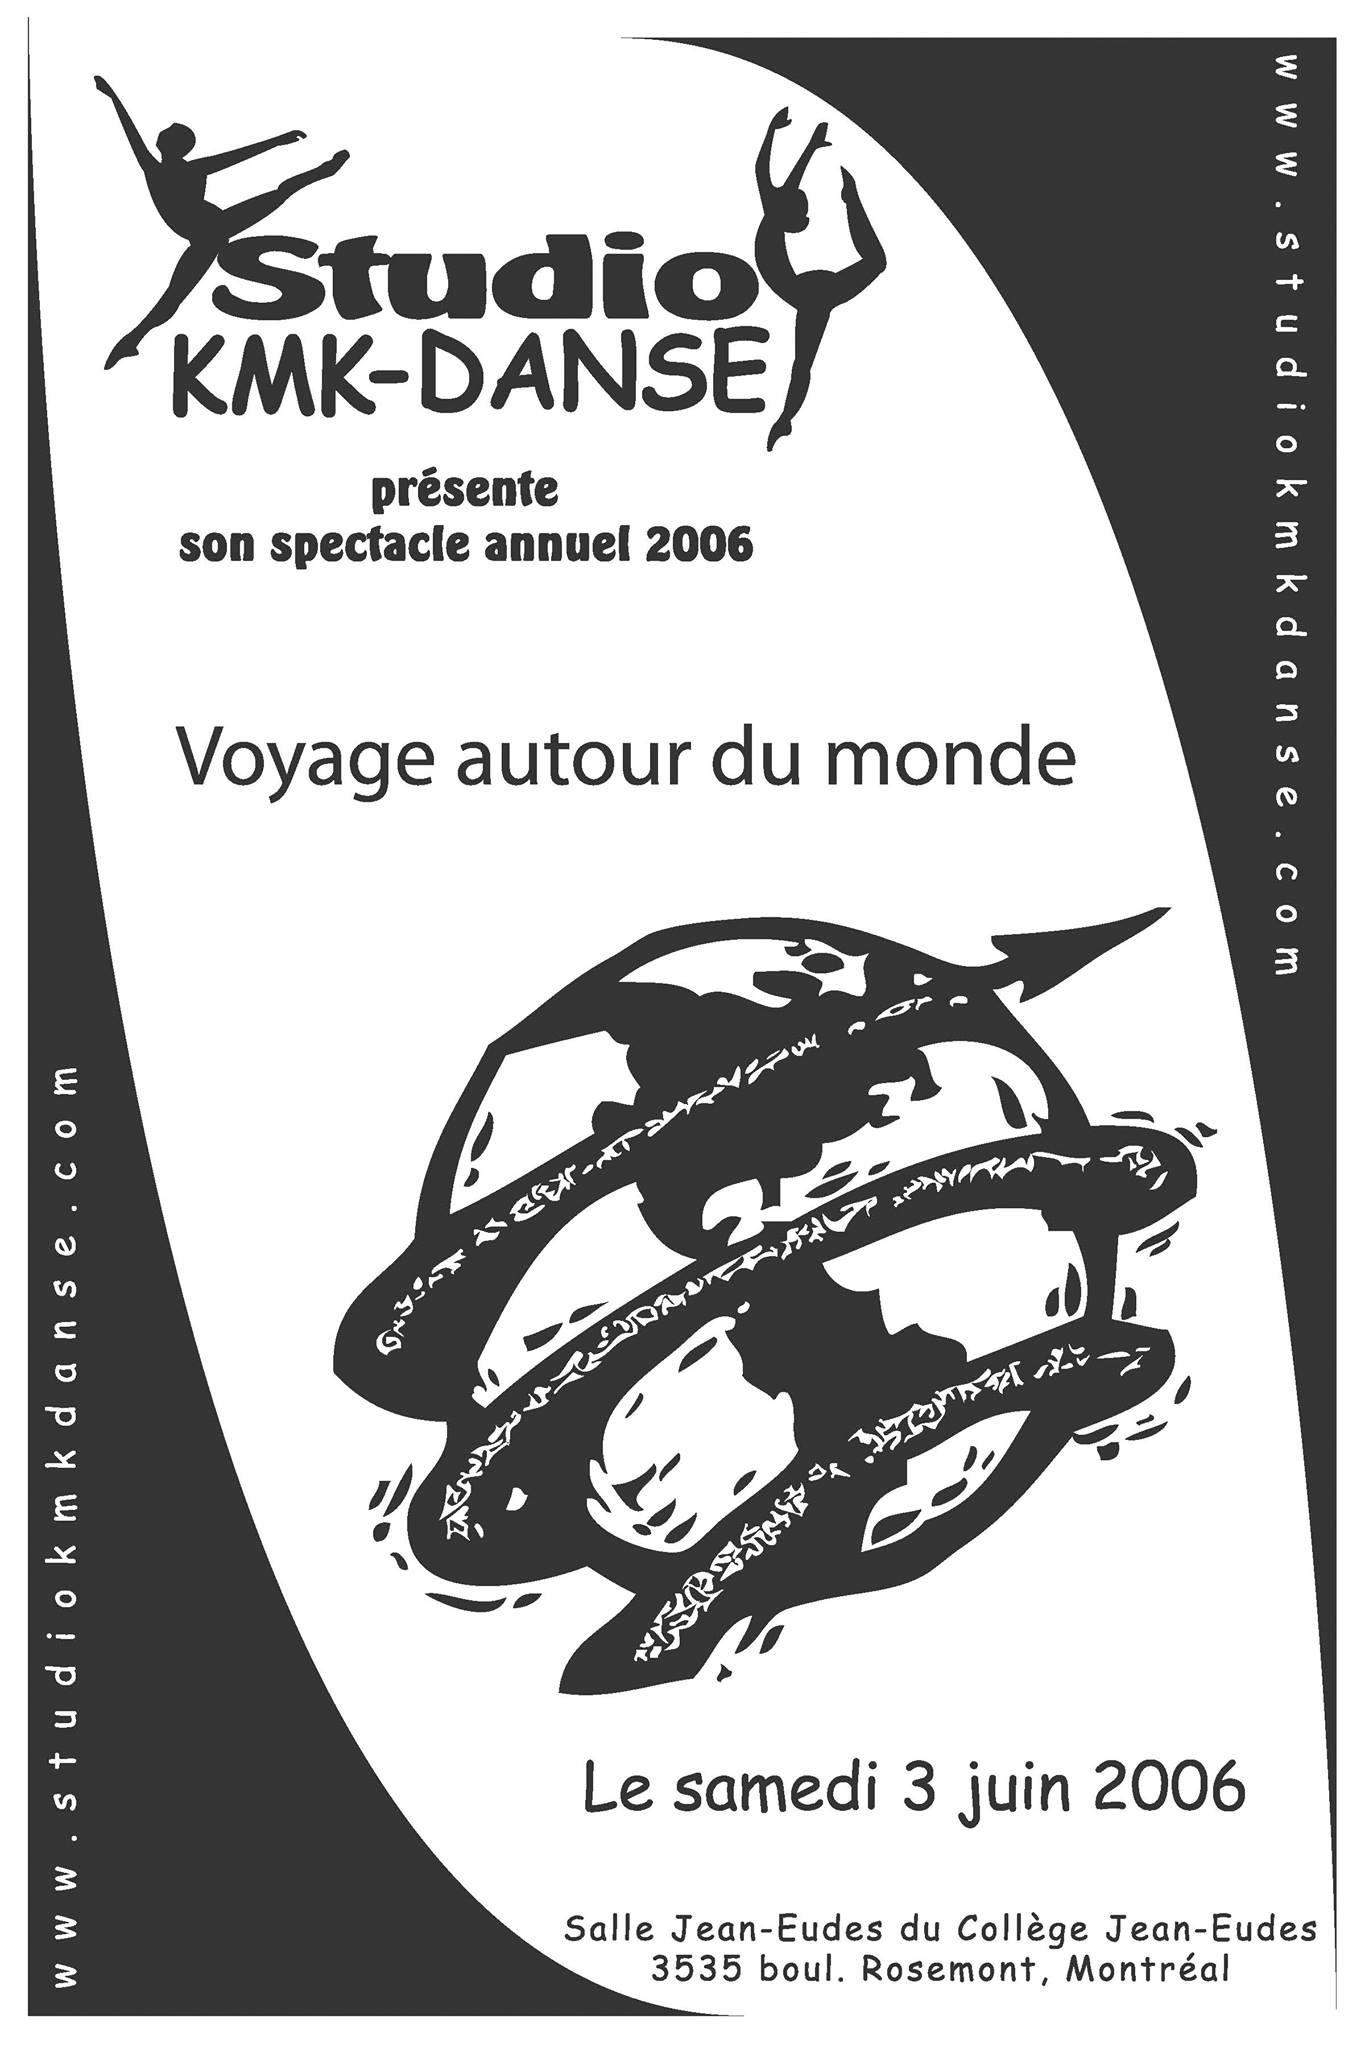 Studio Kmk Danse Histoire